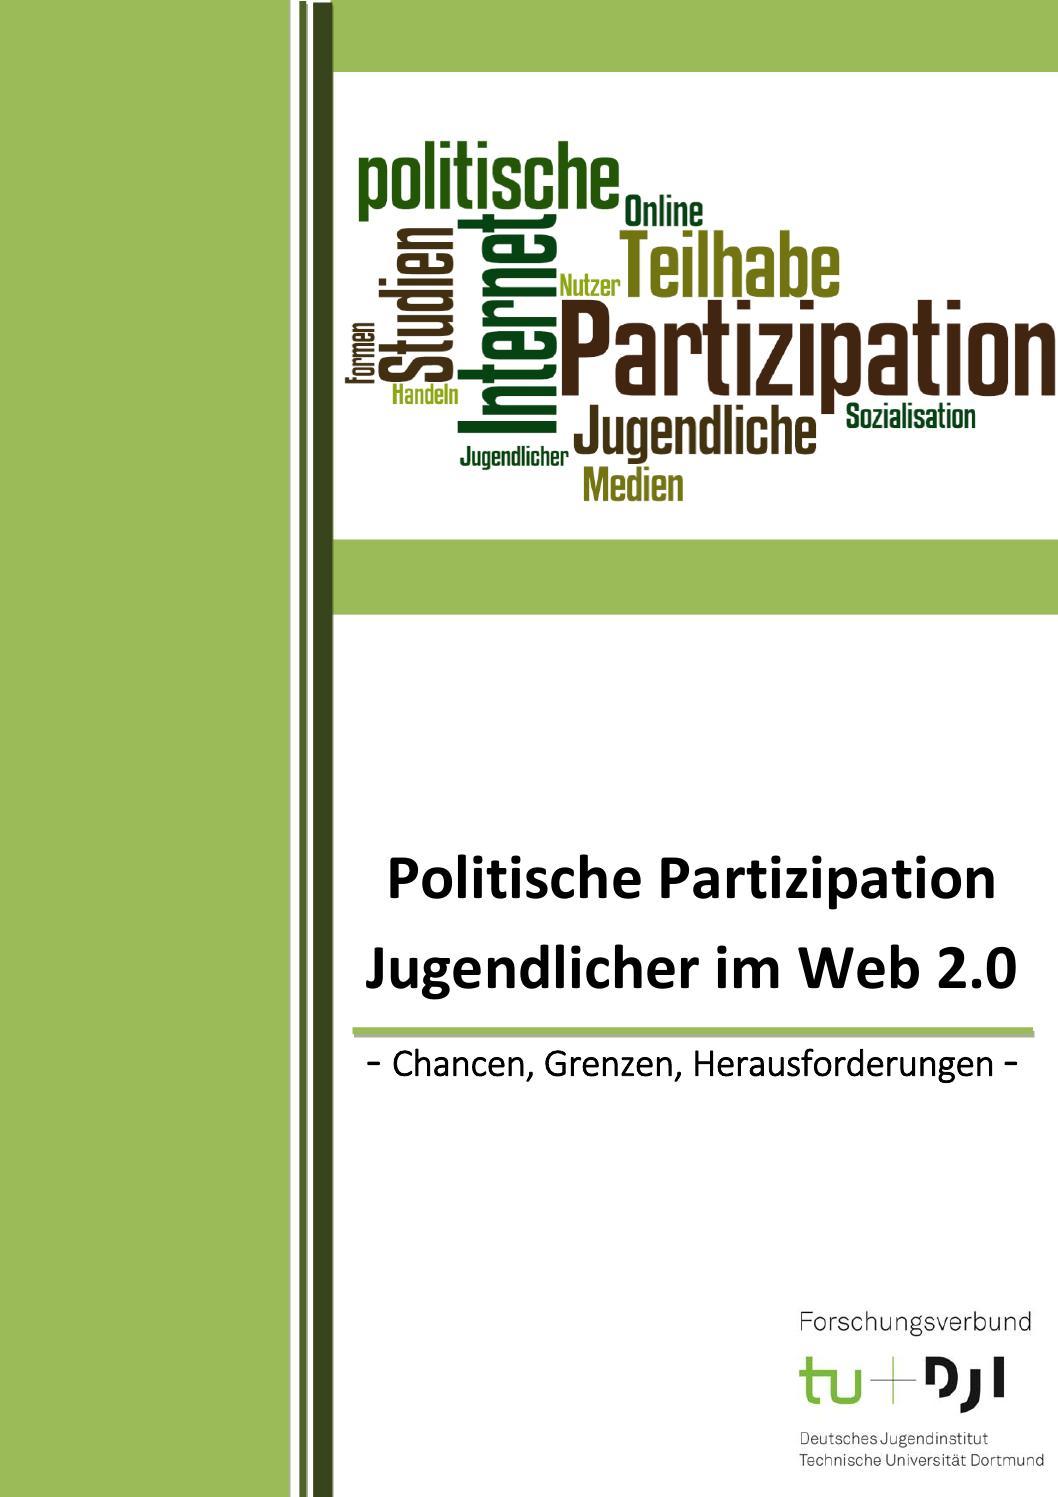 2015 01 expertisen polit partizipation web 2 0 by Goetz Nordbruch - issuu